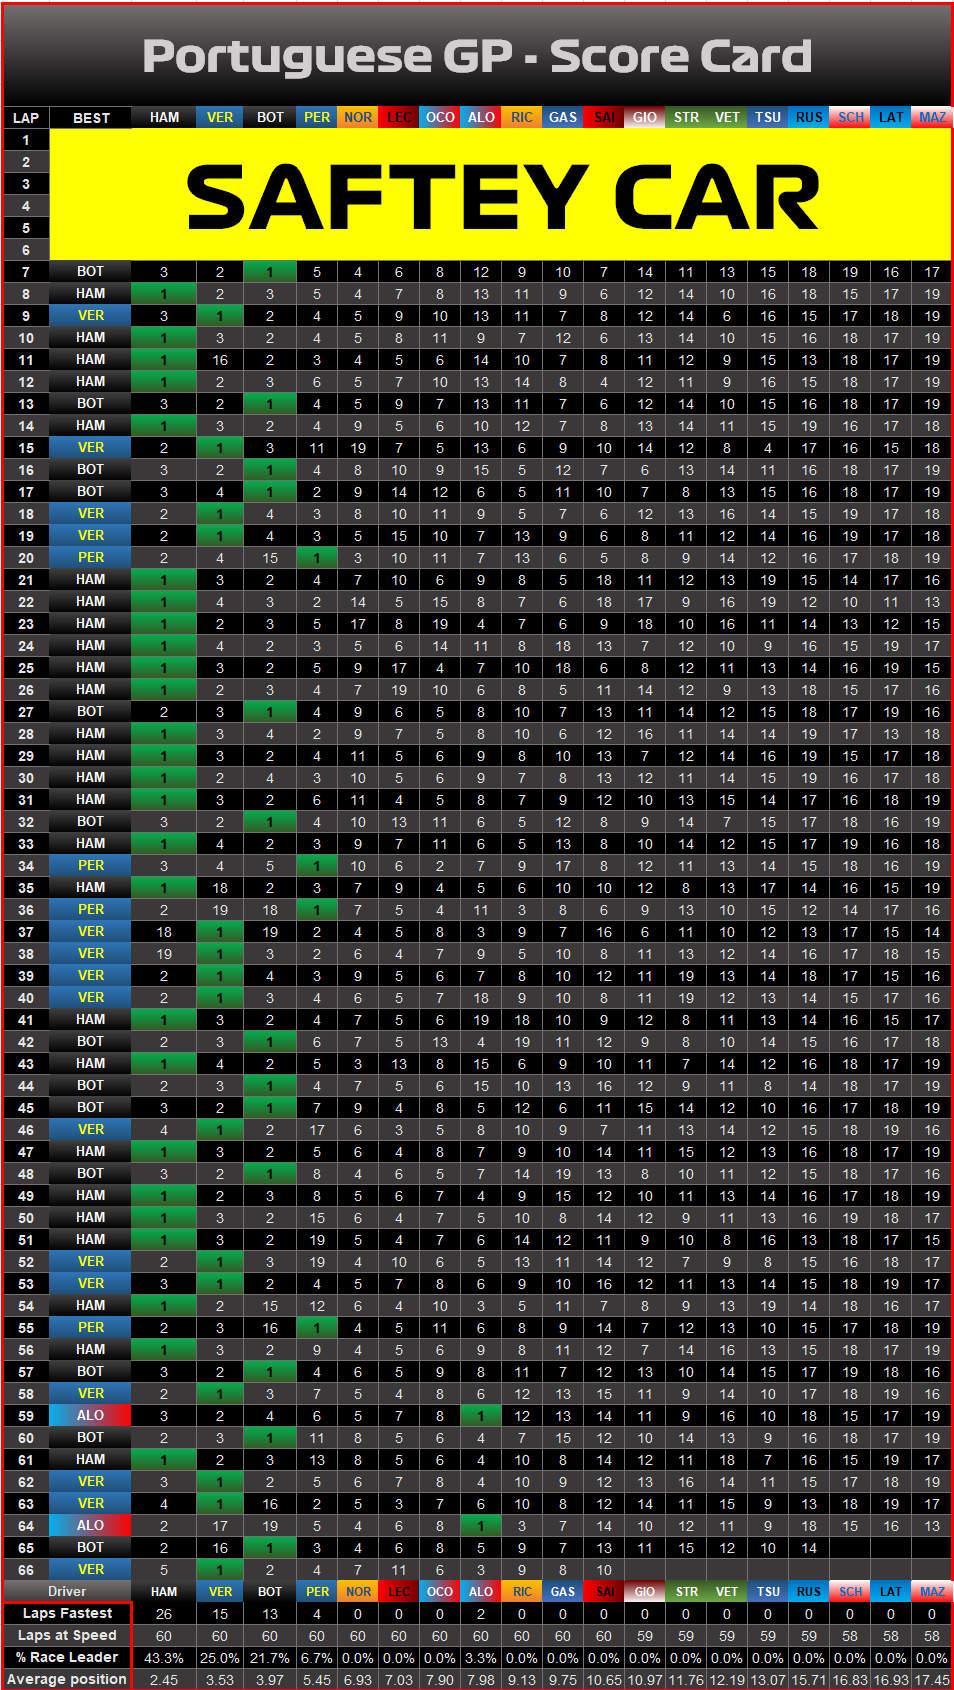 2021 Portuguese Grand Prix statistics results